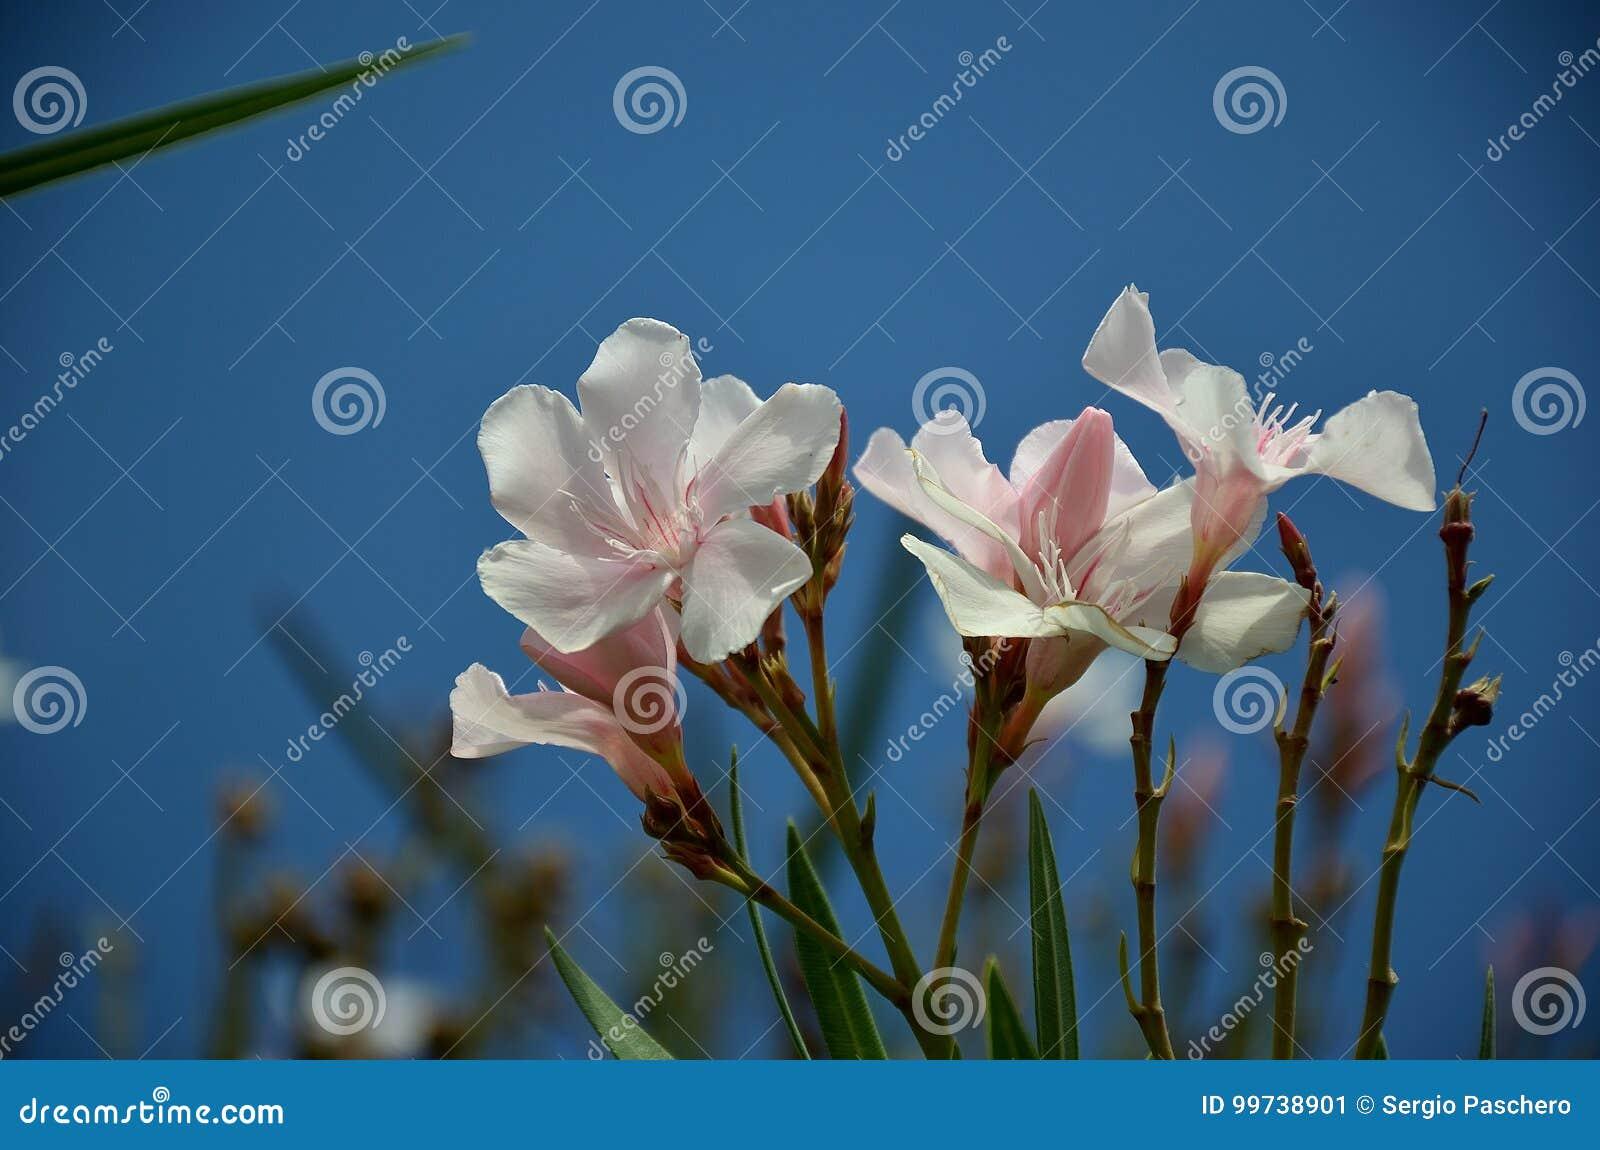 White oleander flower in summer bloom stock image image of leaves white oleander flower in summer bloom mightylinksfo